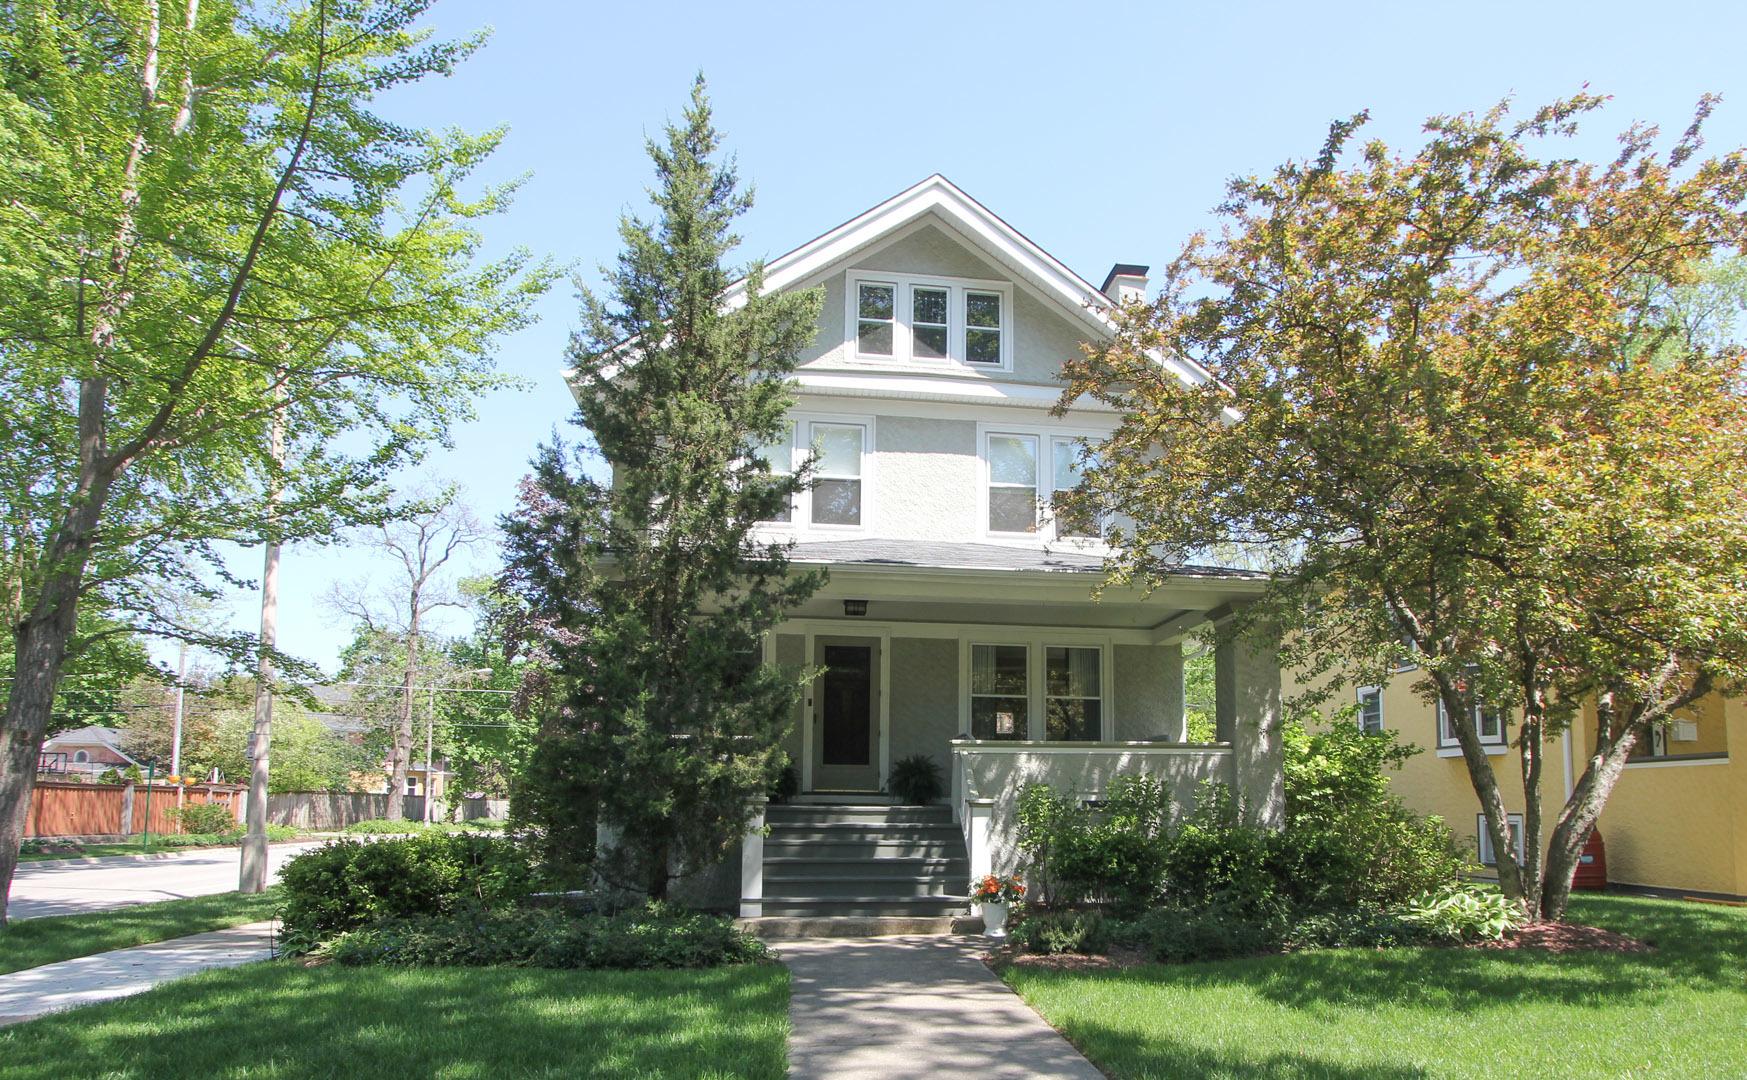 800 Clinton Avenue, Oak Park in Cook County, IL 60304 Home for Sale